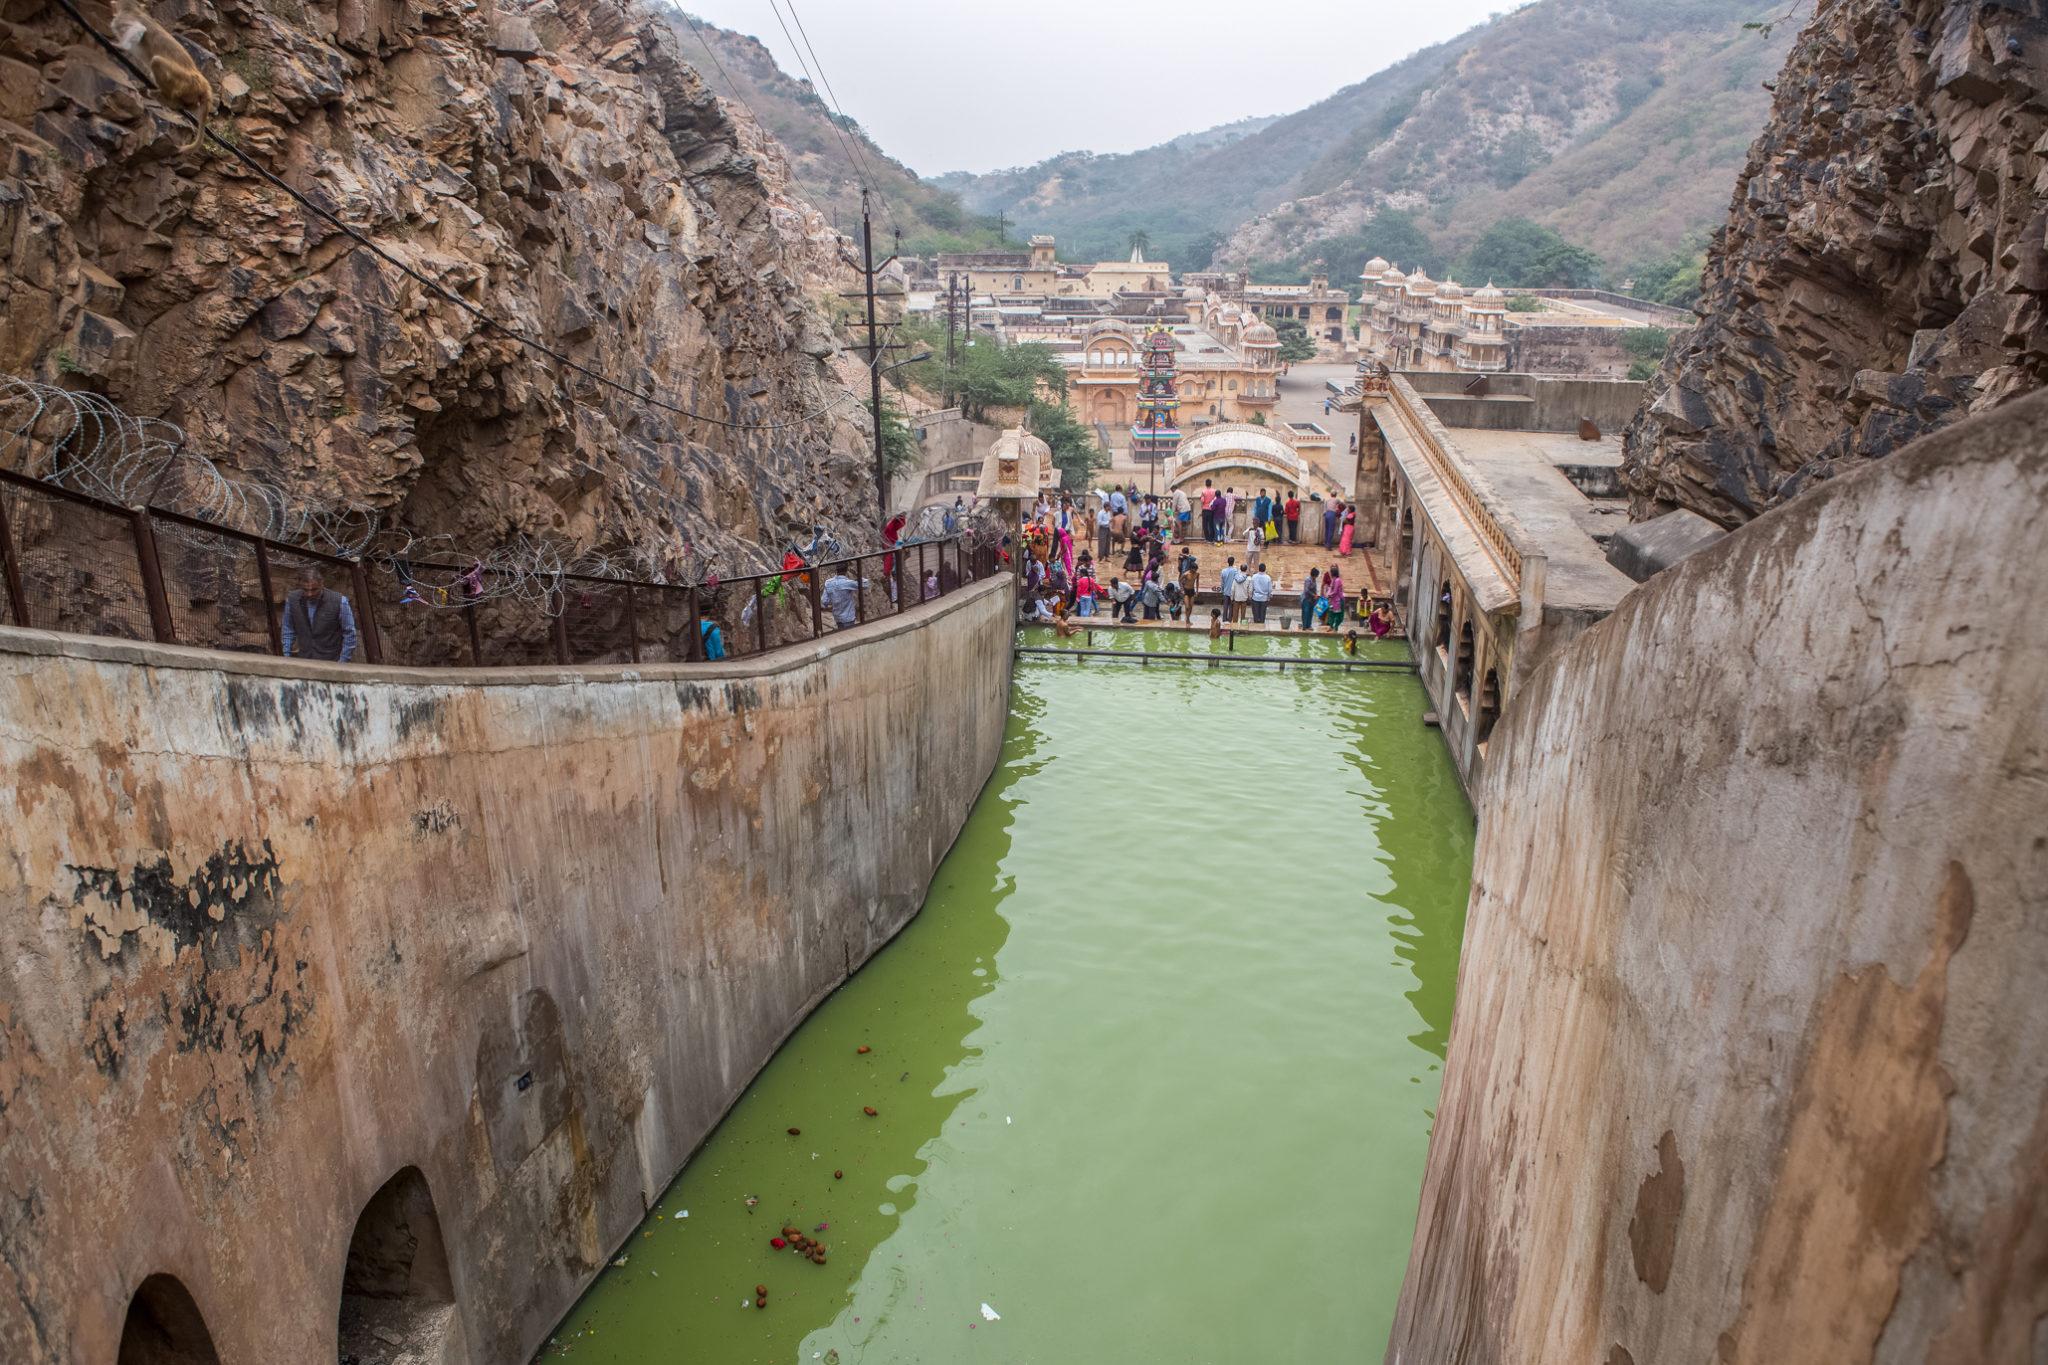 monkey-singe-temple-visite-inde-jaipur-voyage